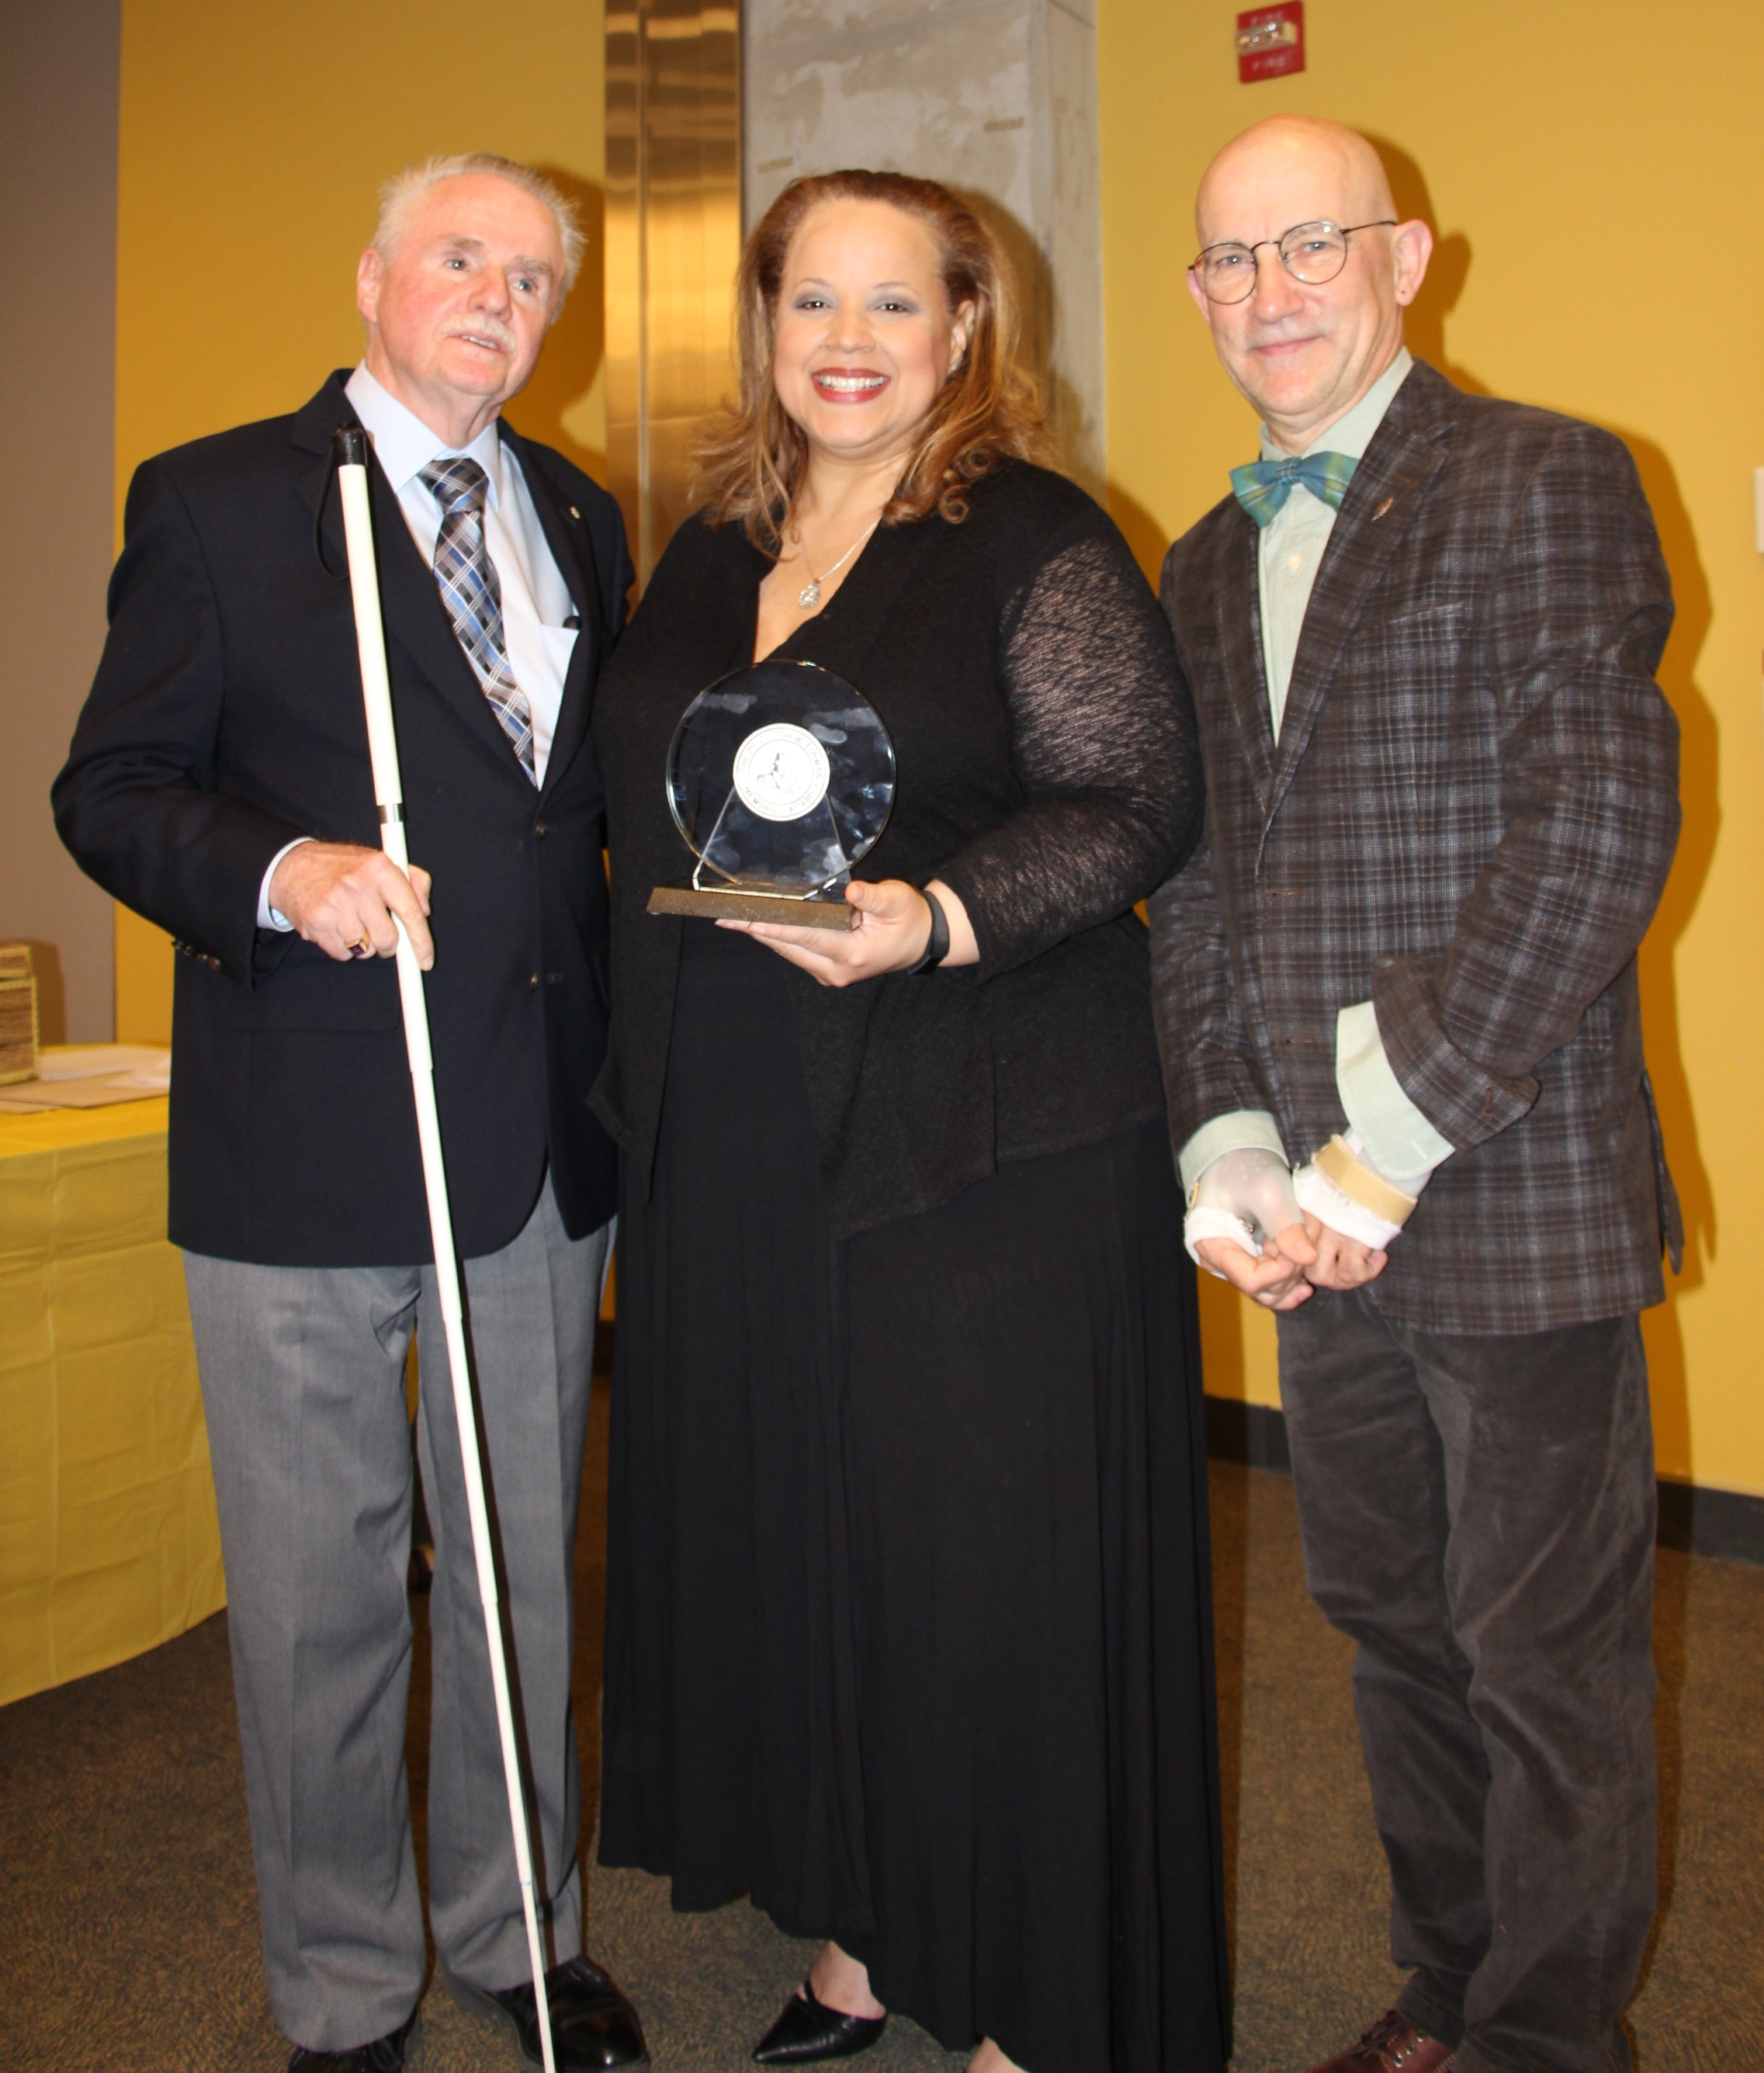 Rosemary Kavanagh awarded the Dayton Forman Award